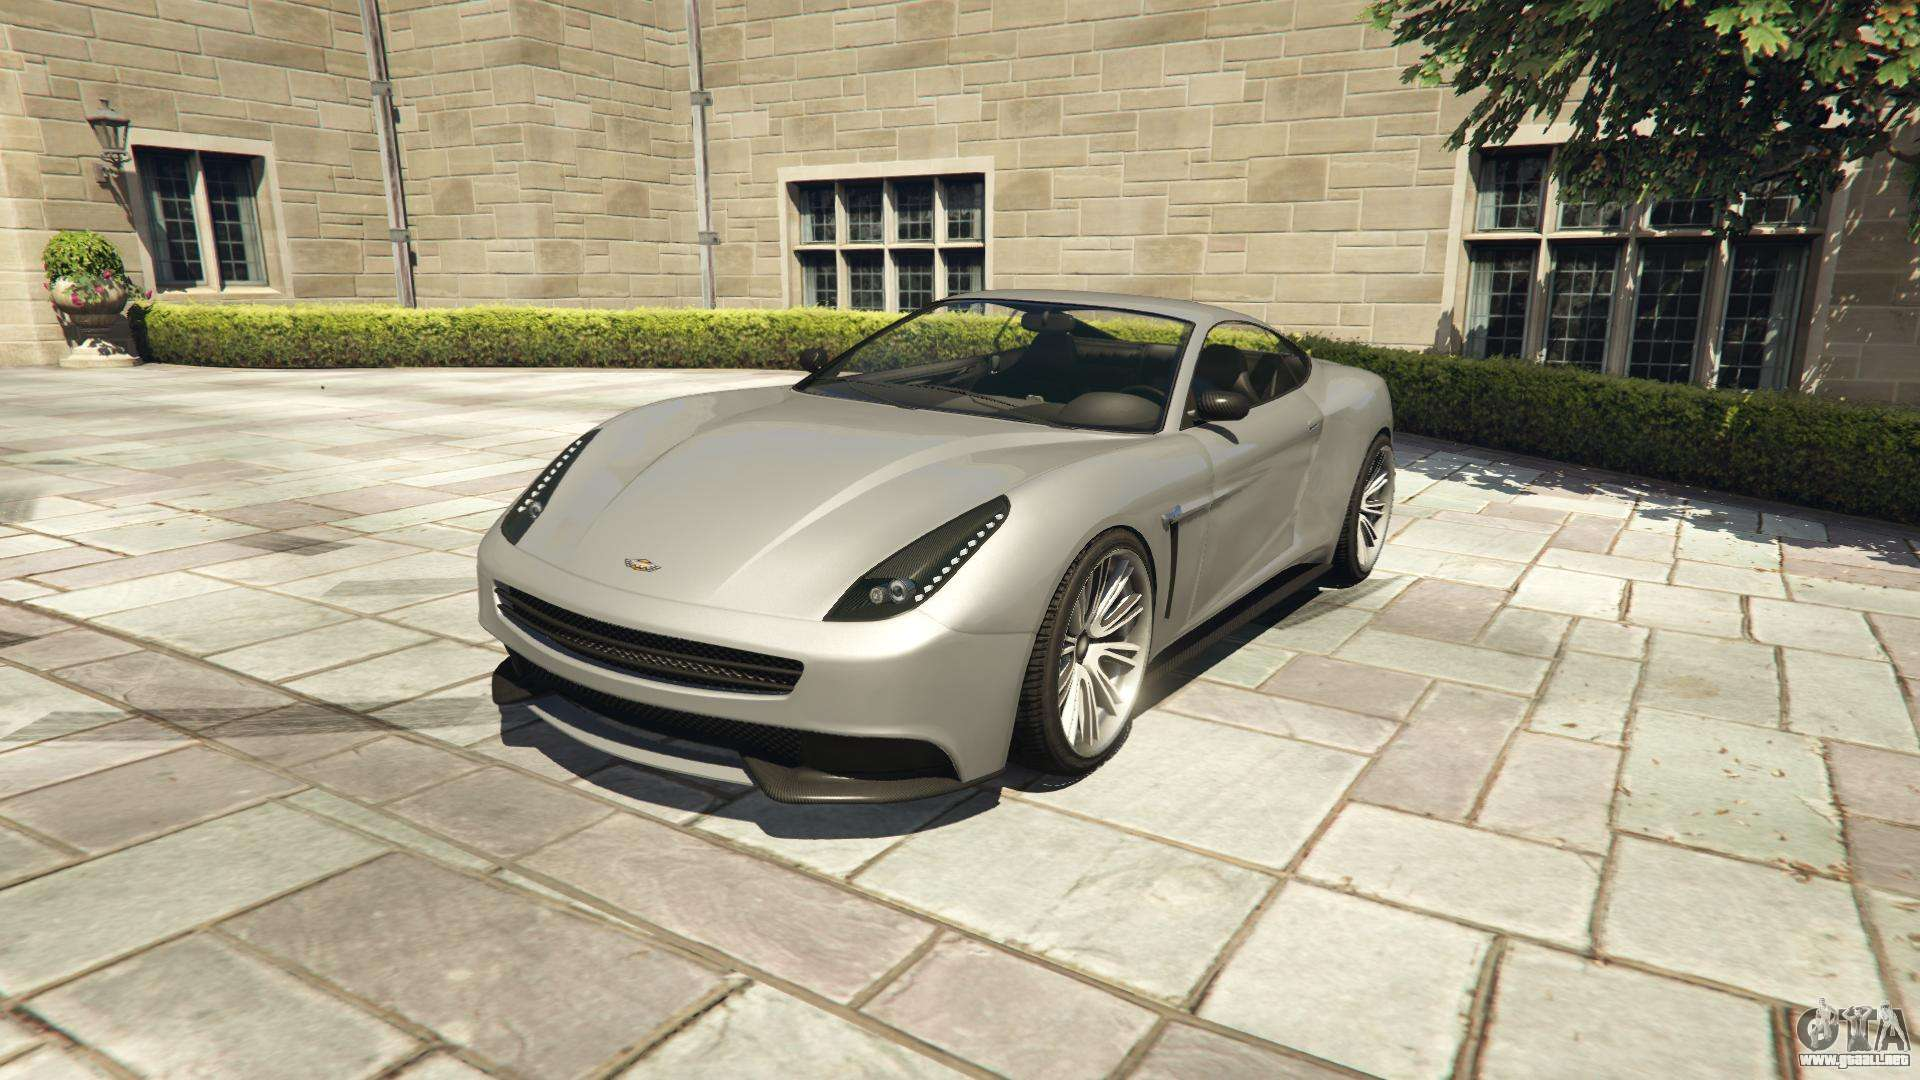 Dewbauchee Massacro GTA 5 - vista frontal